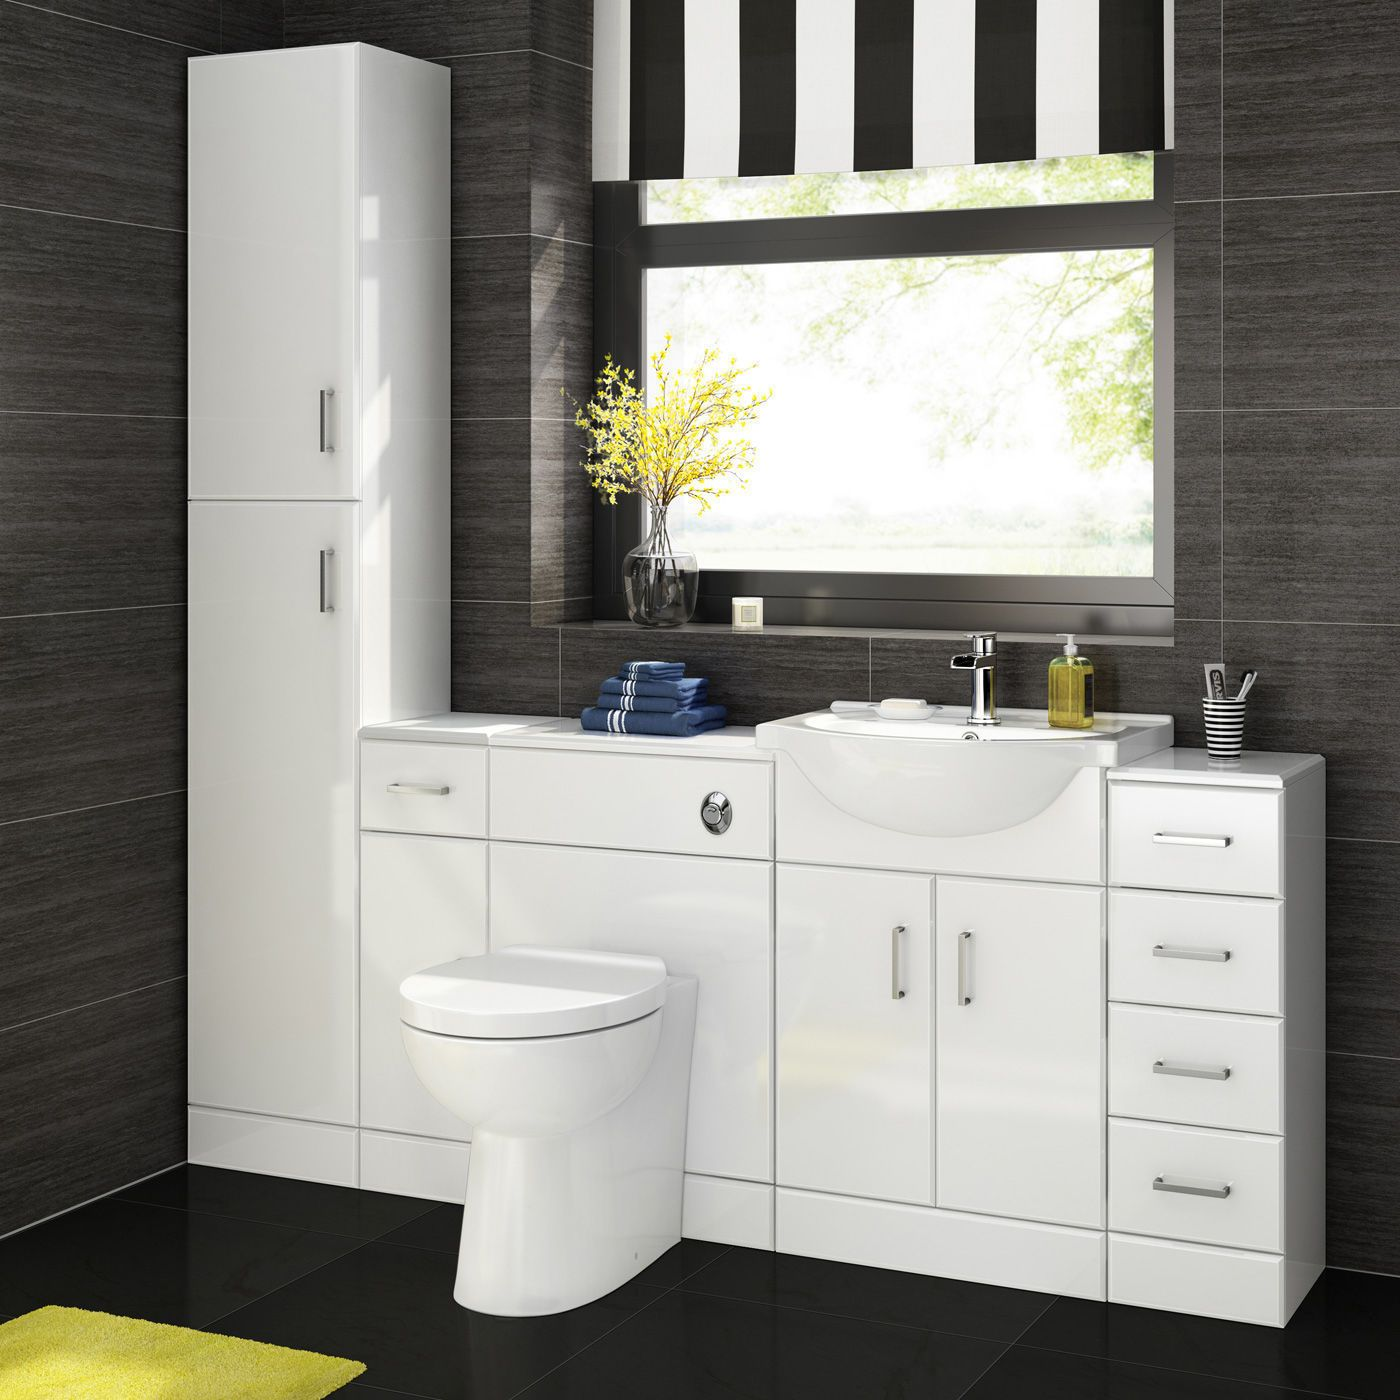 Bathroom Sink Cabinet Vanity Unit White Basin Storage Furniture Door ...